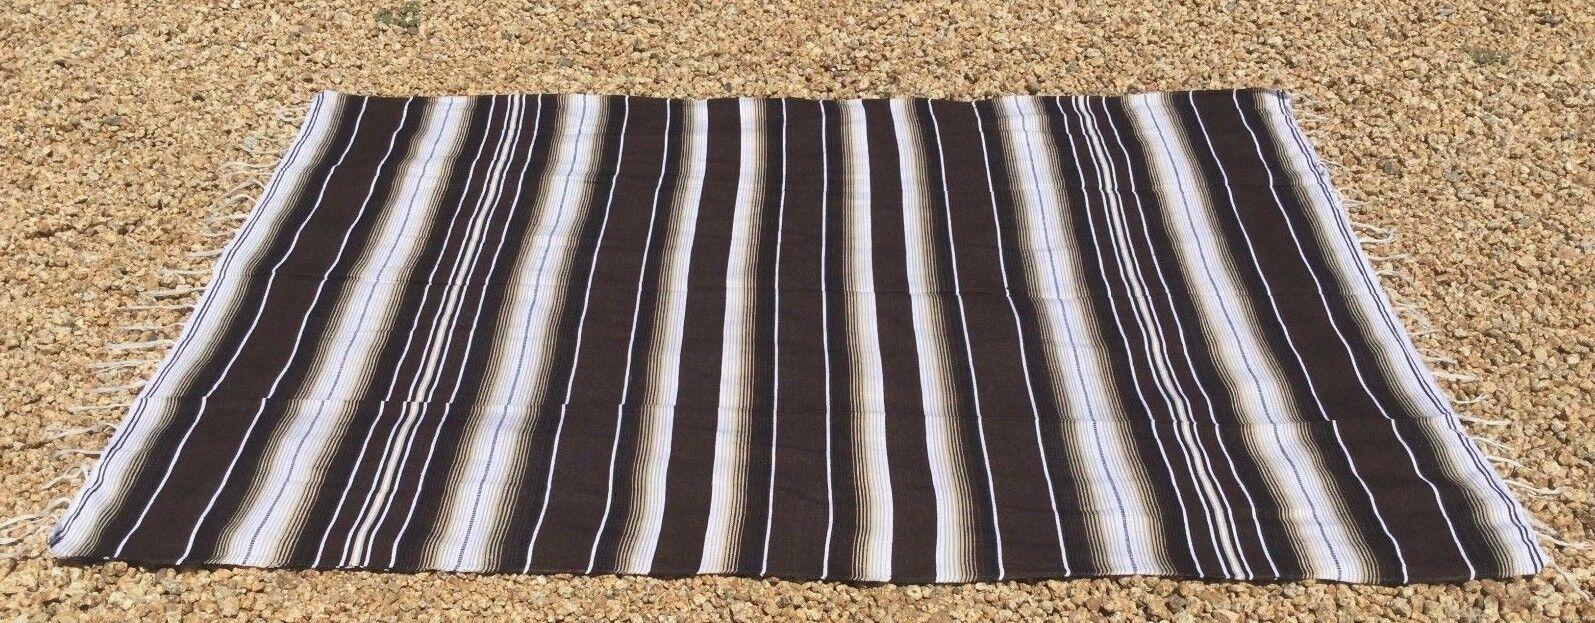 Mexican Blanket Sarape Multi-Color Brown #2